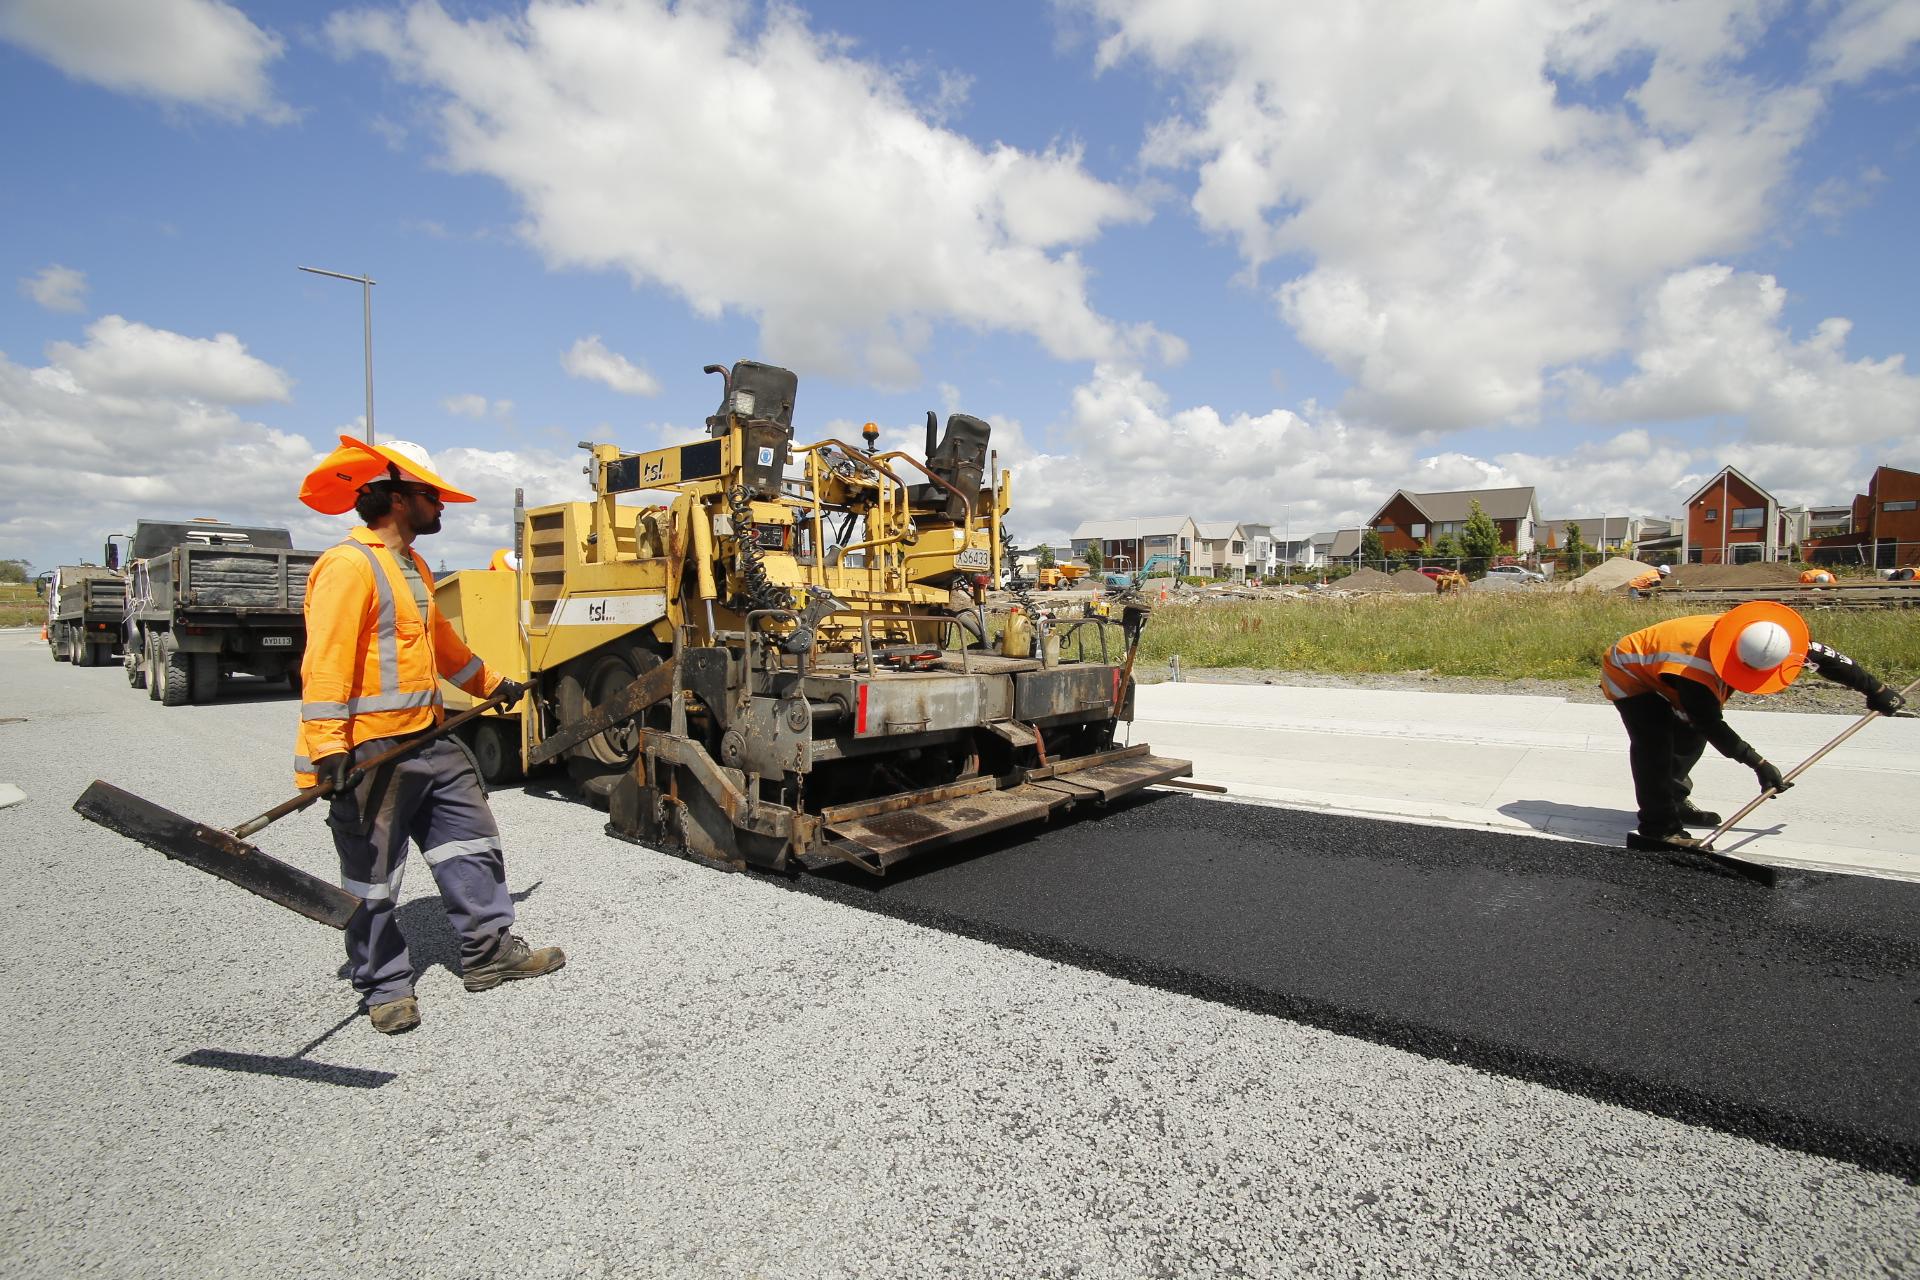 Asphalt paver and workman laying new asphaltic concrete.